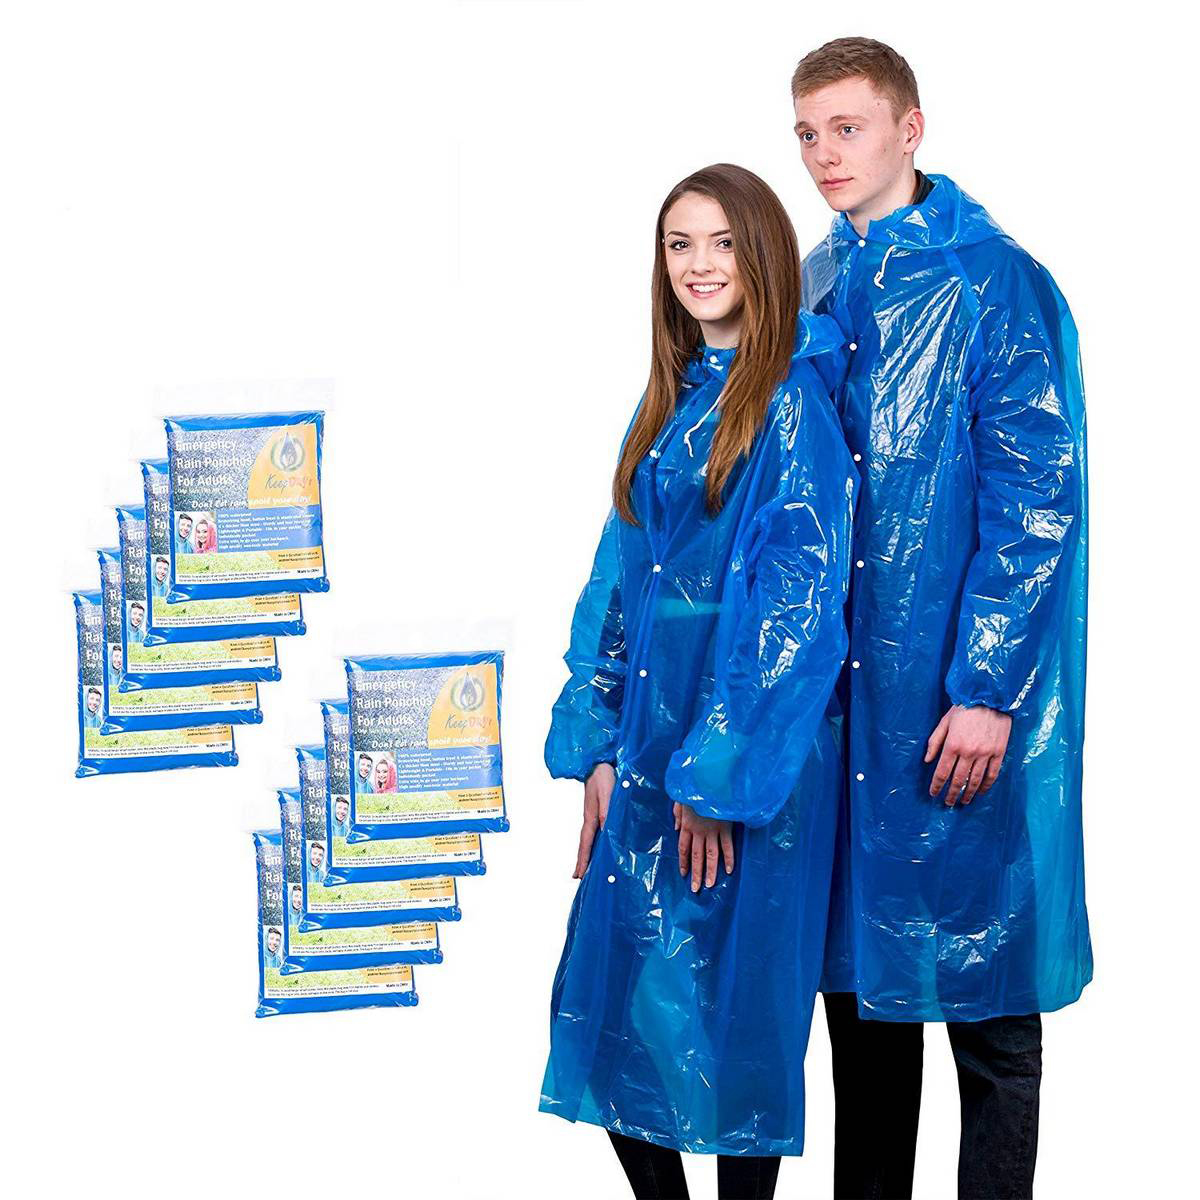 Impermeable Women/Men Long Raincoat Female Windbreaker Transparent  Waterproof  Rain Coat.